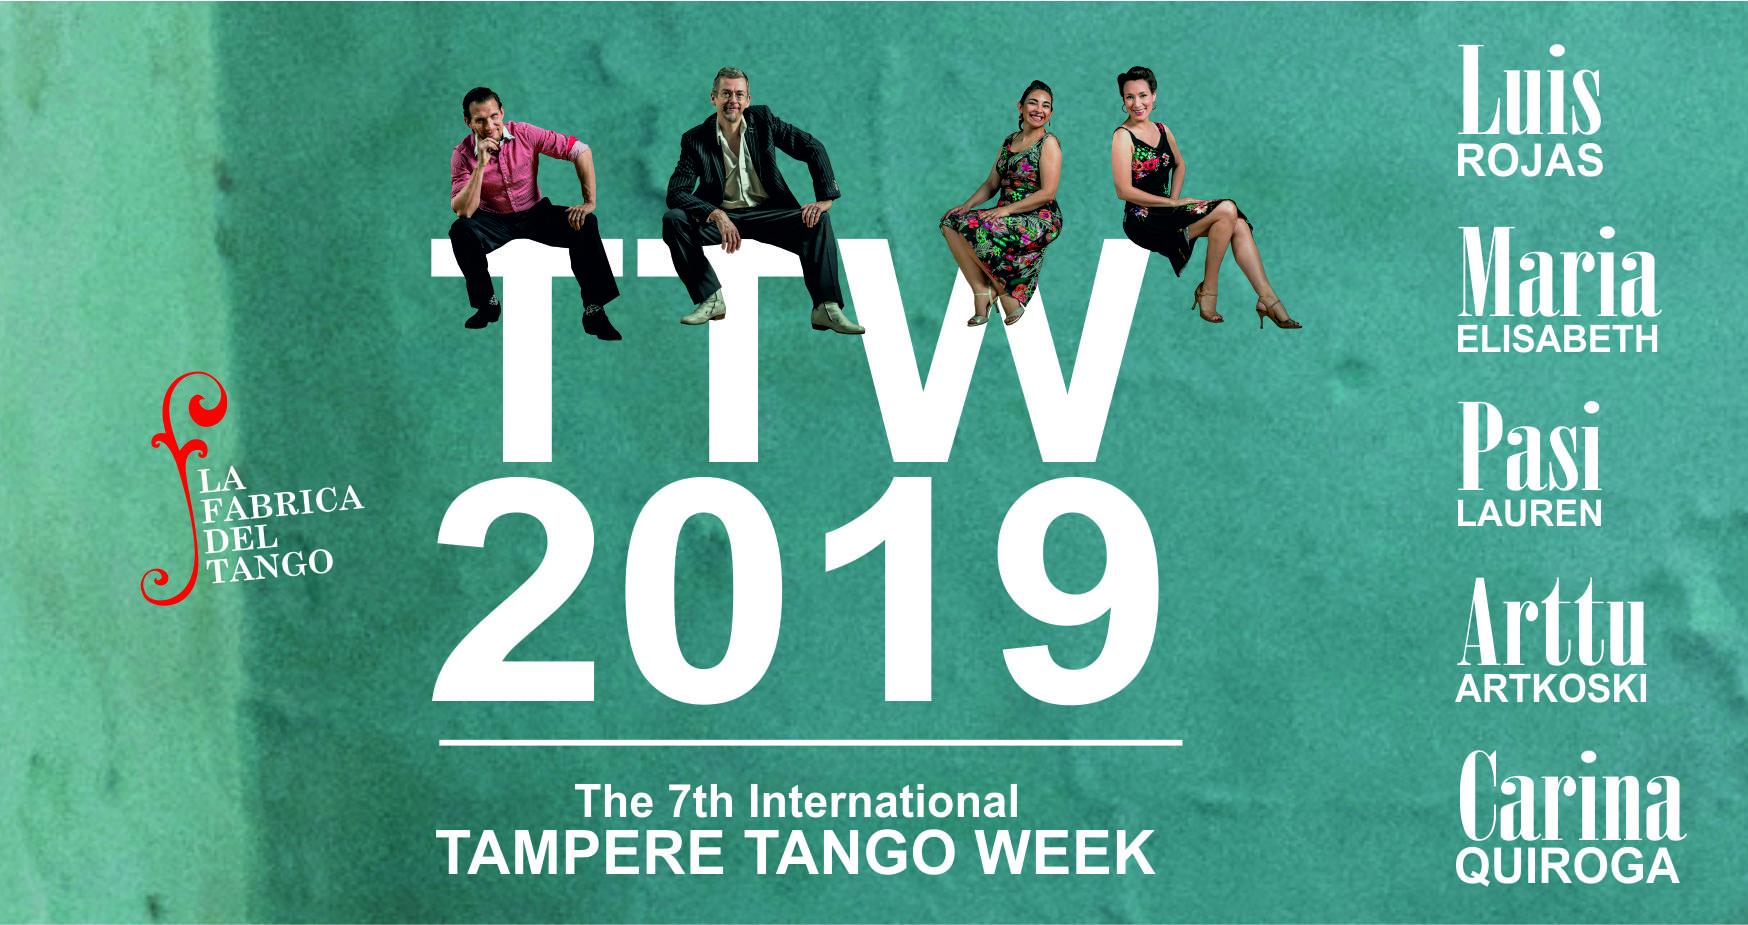 La T3 tango workshop